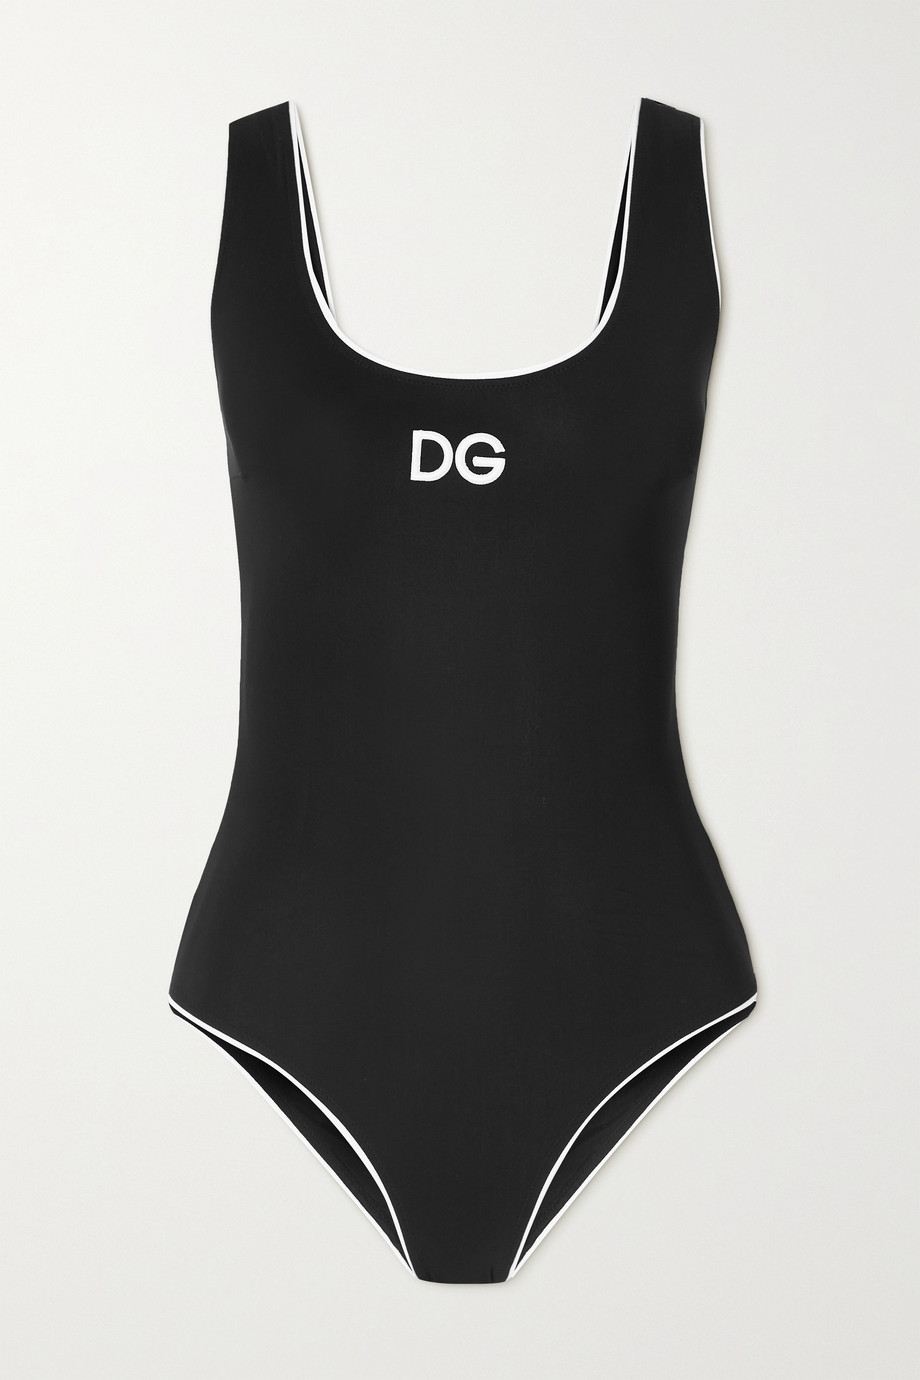 Dolce & Gabbana Olympic Badeanzug mit Stickerei